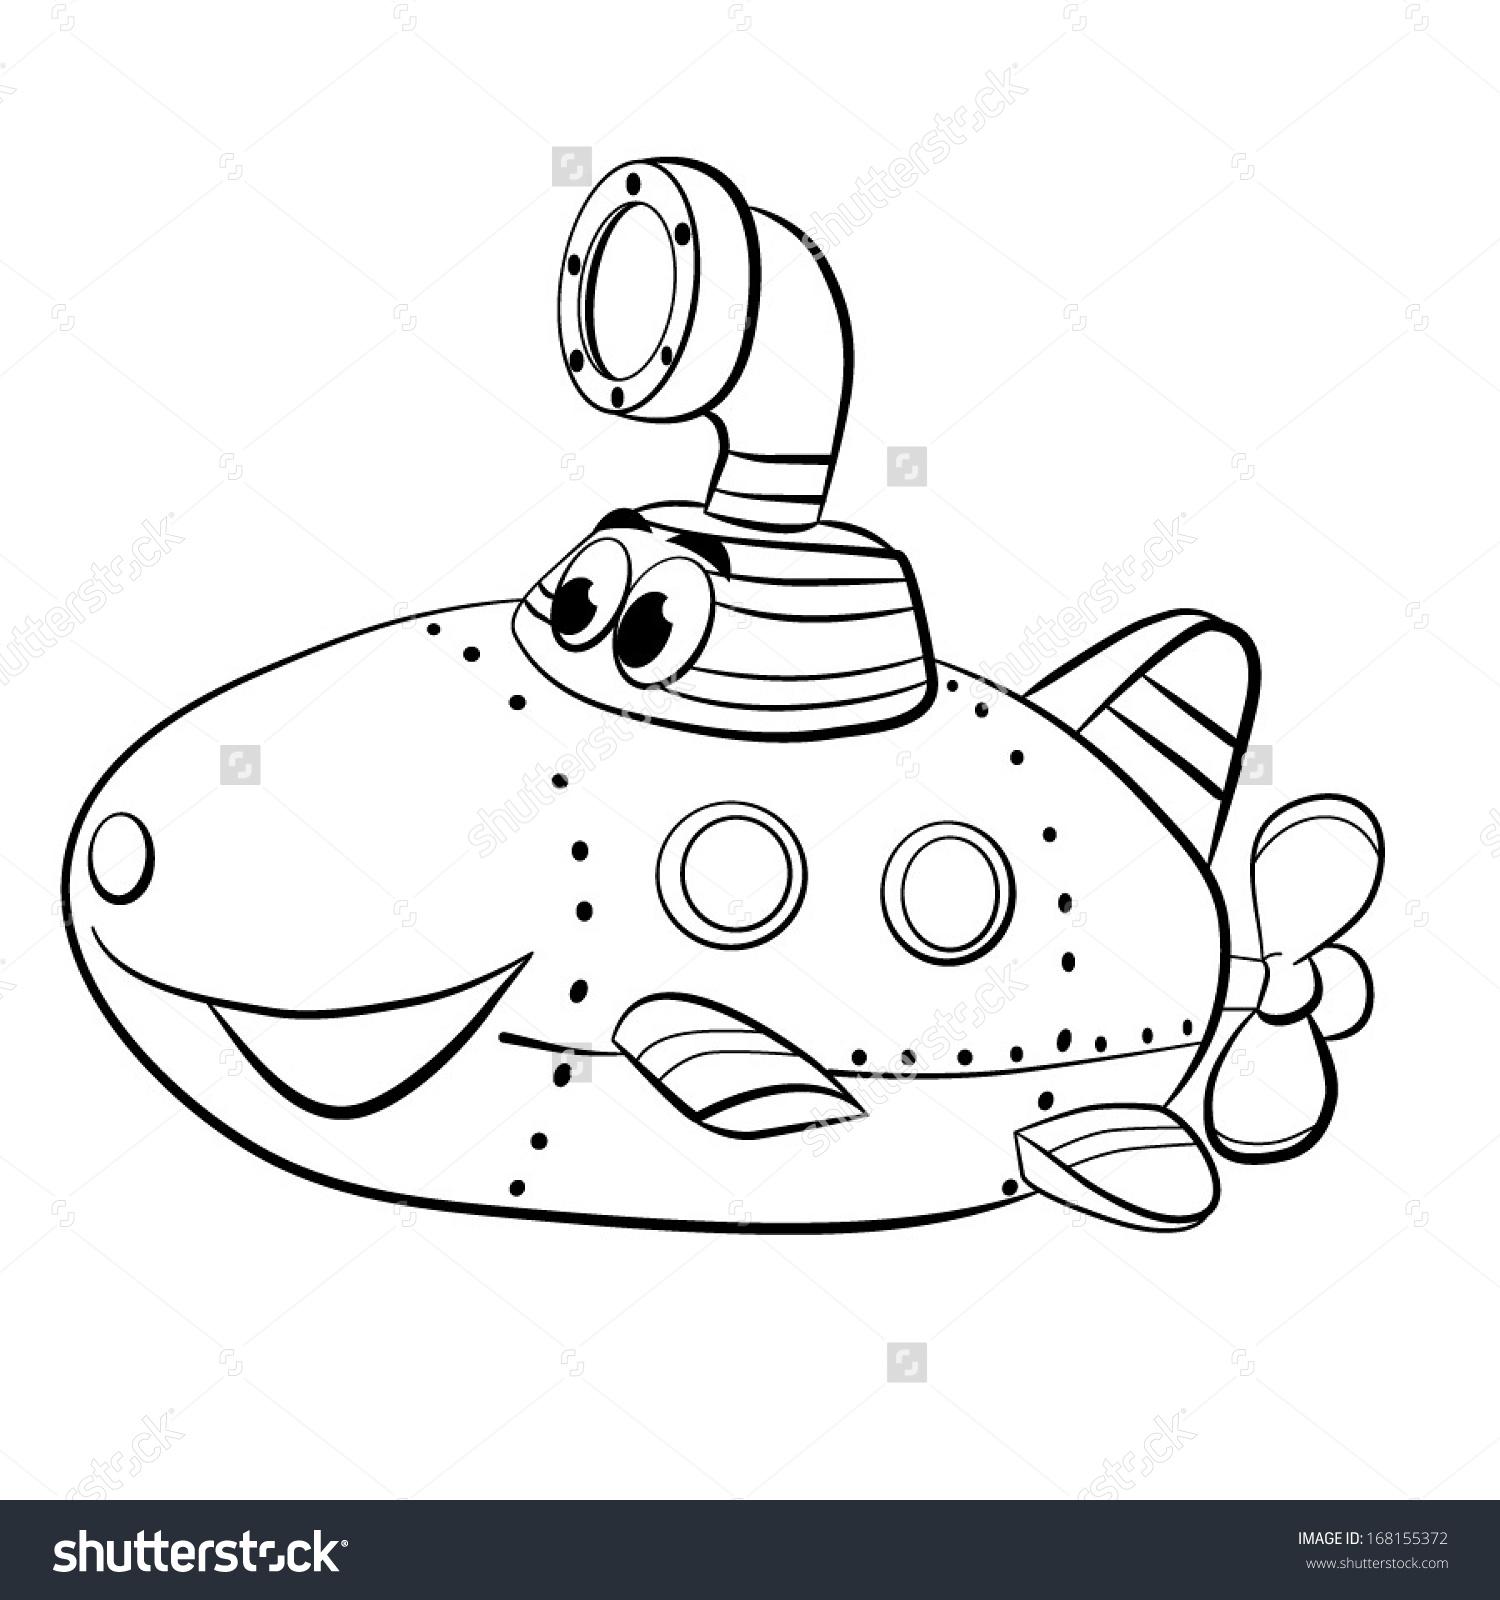 Contour Blackwhite Cartoon Merry Submarine Boat Stock Vector.